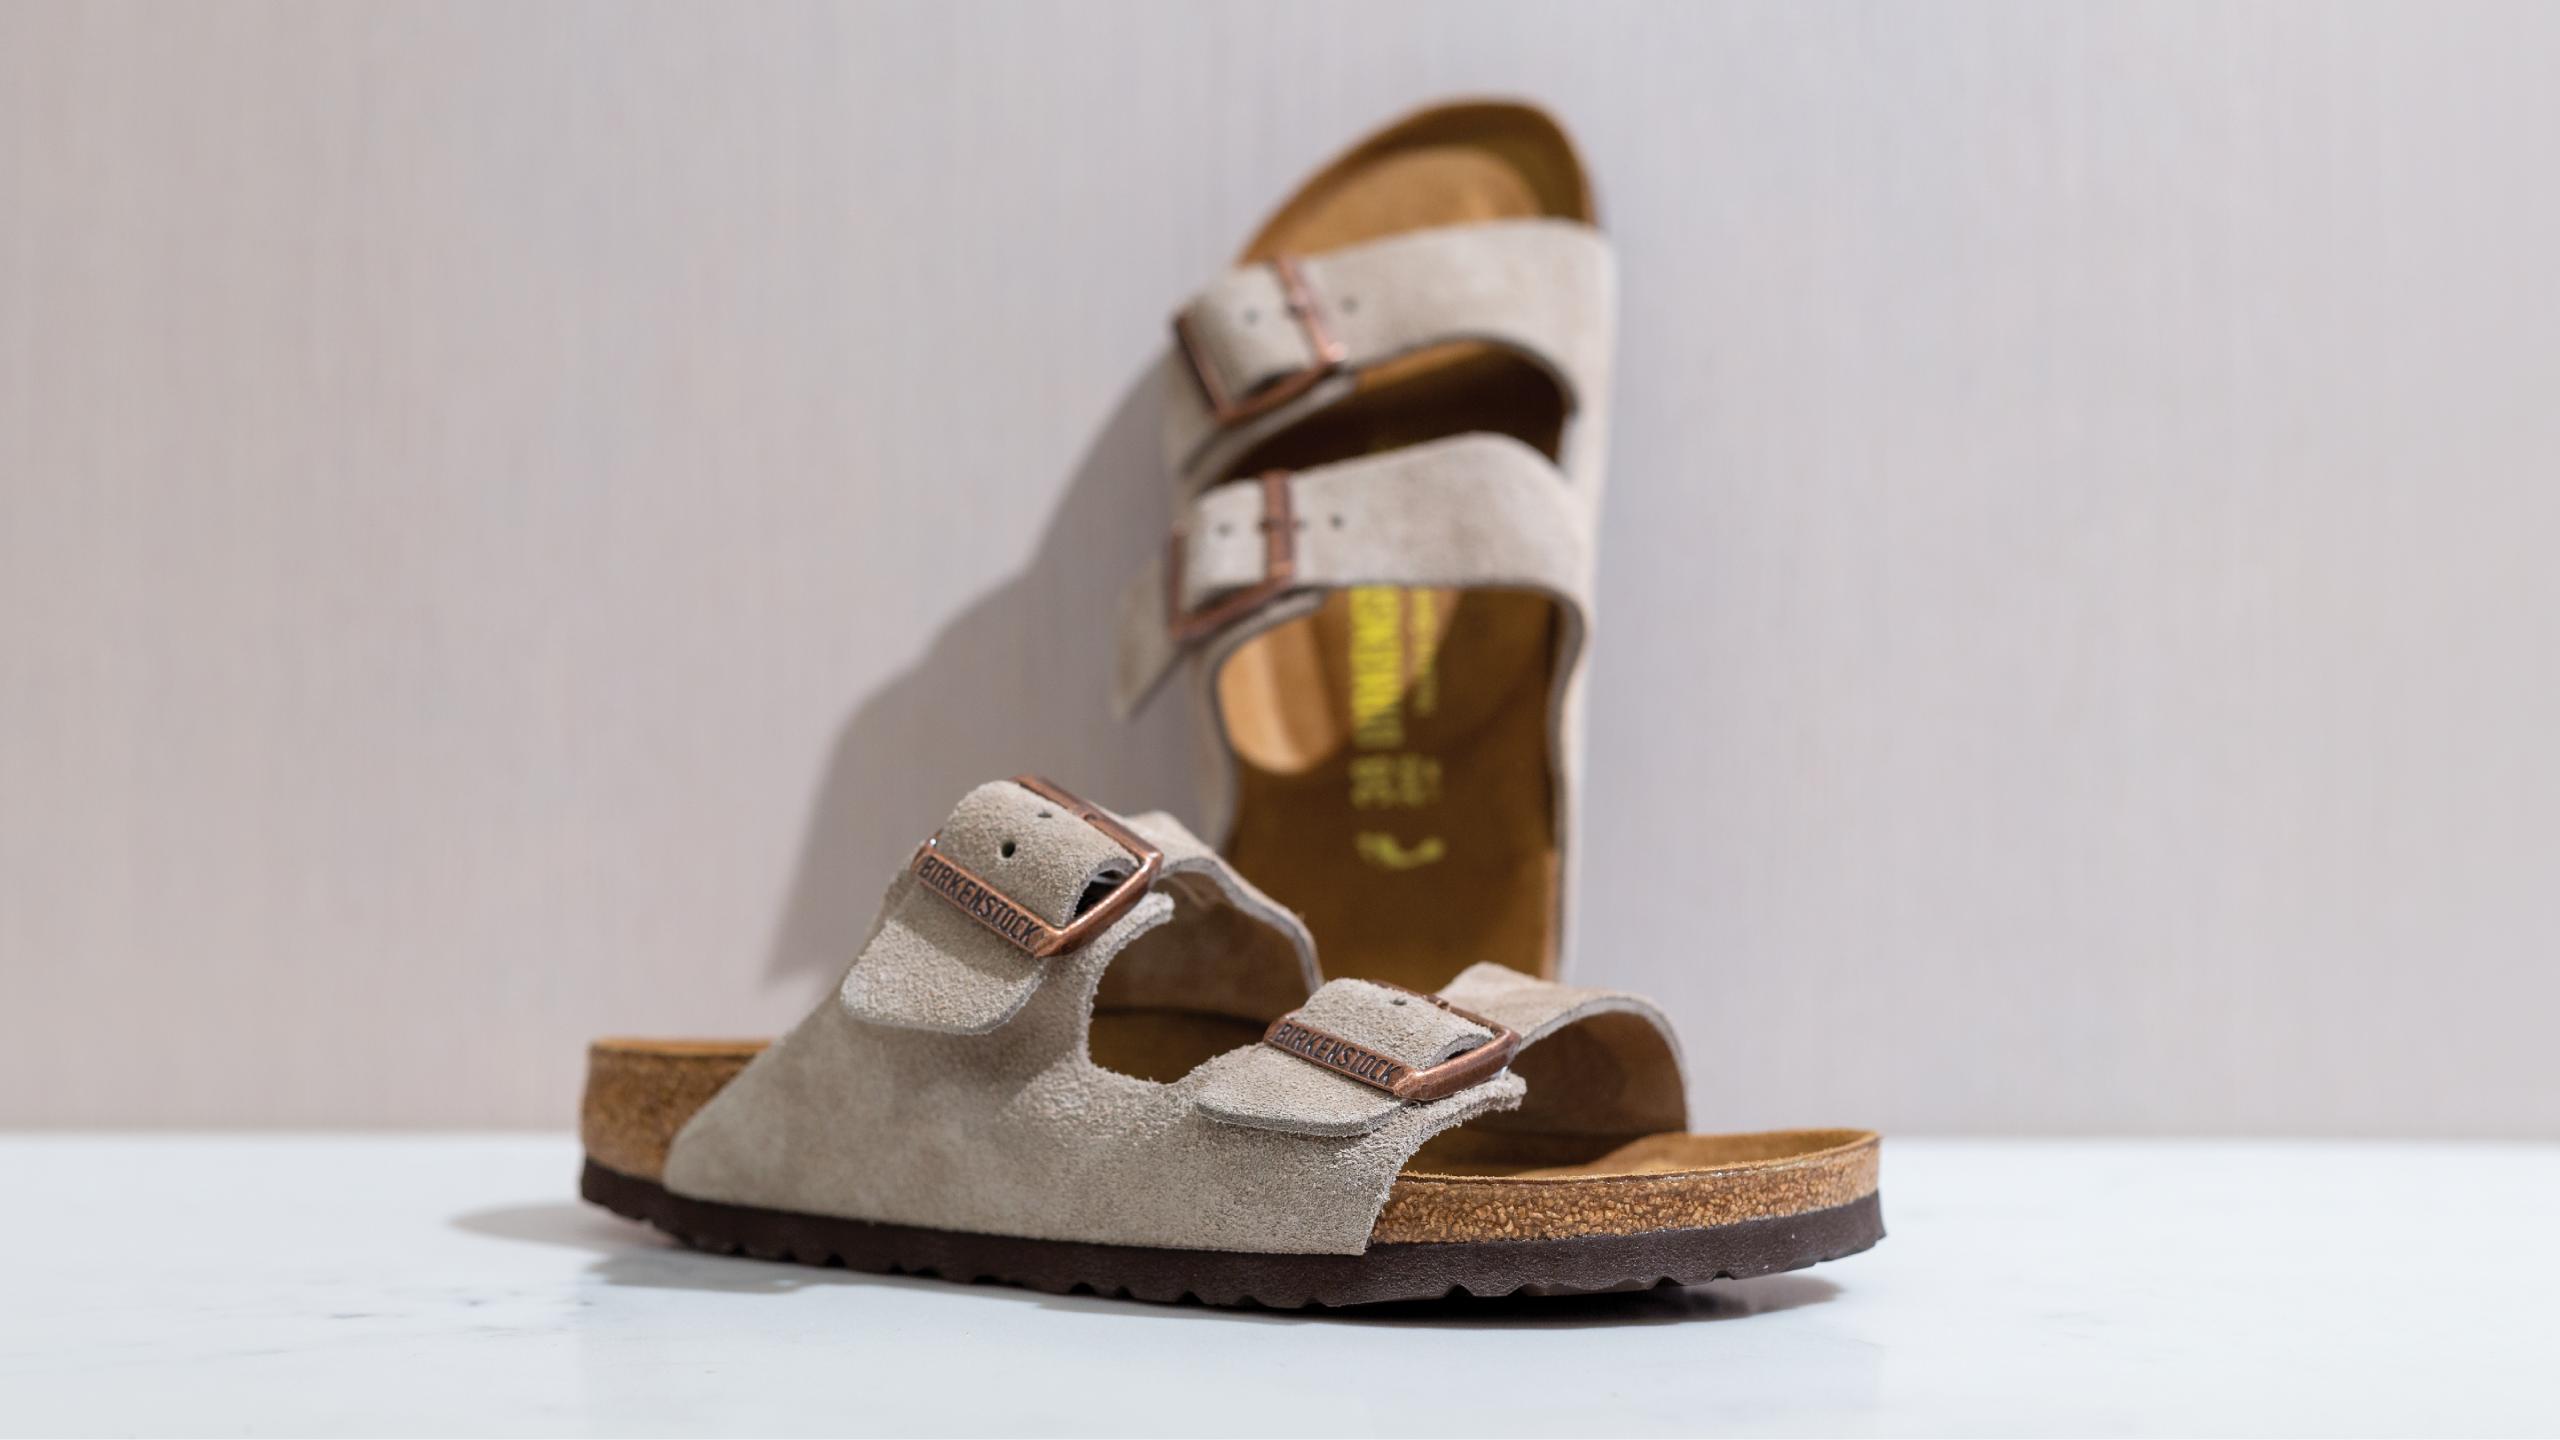 b7037b62f816 How Birkenstocks Morphed From Geeky to Trendy – Adweek